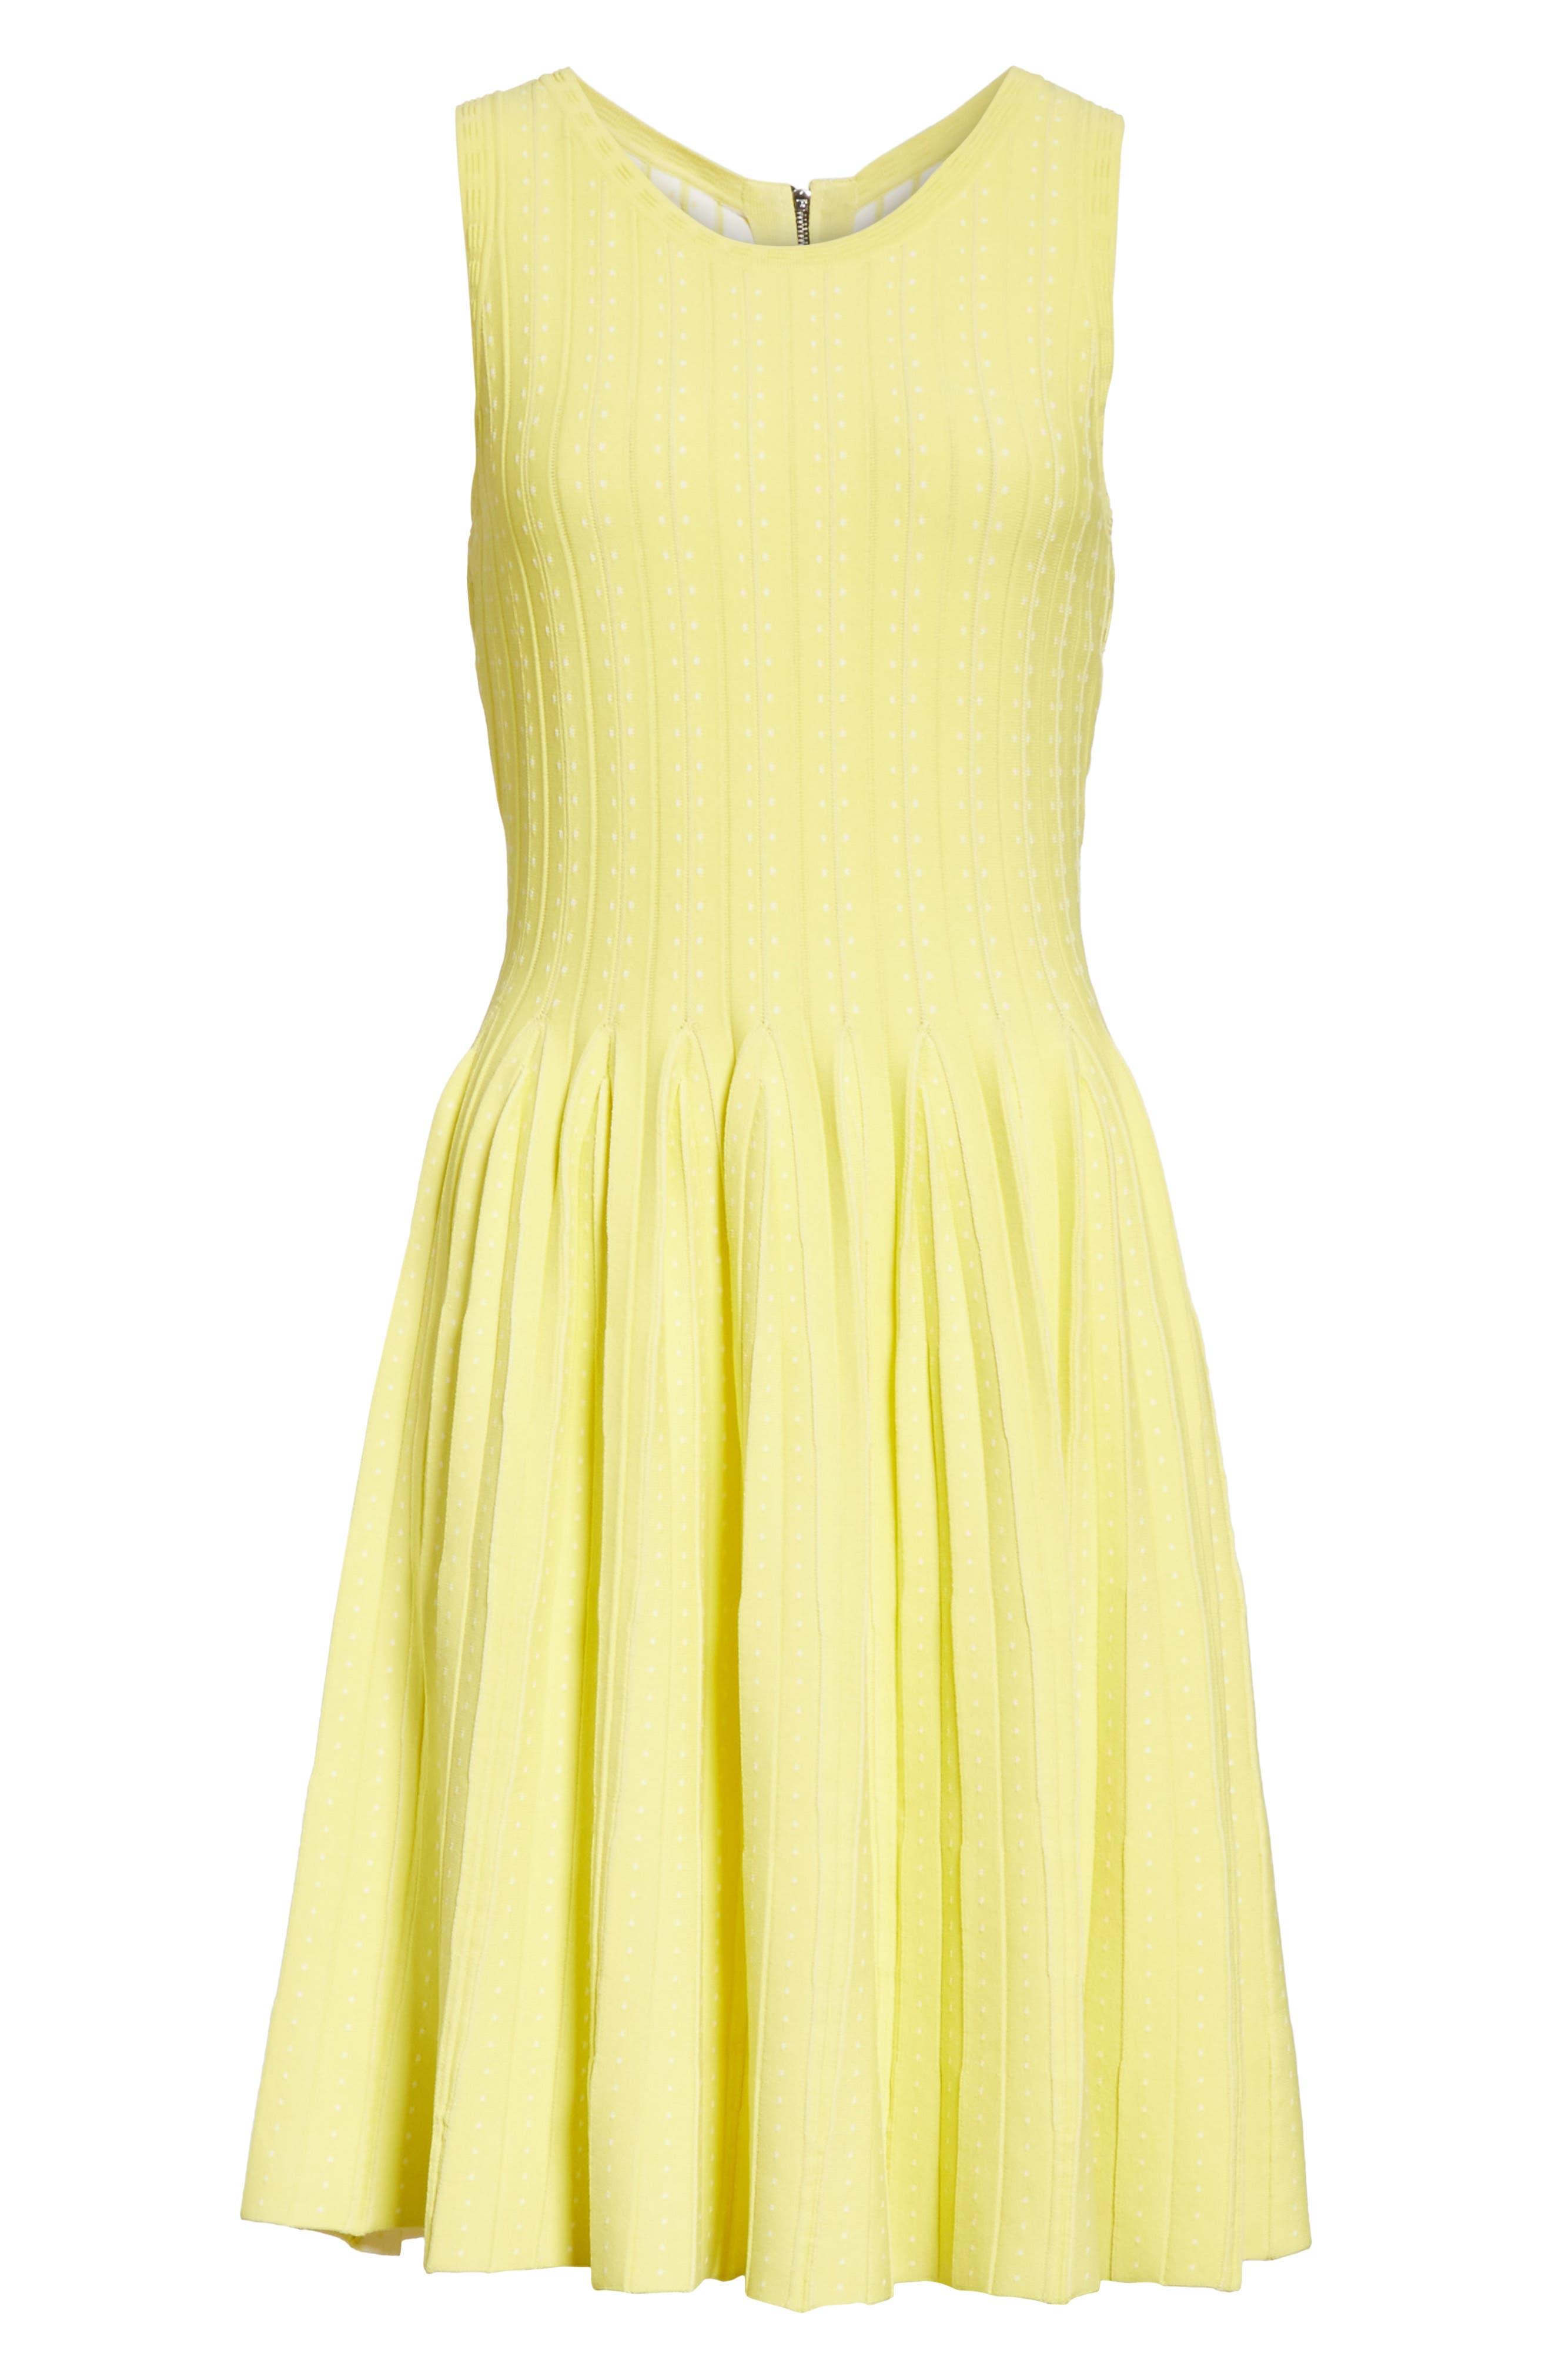 Dot Pleat Fit & Flare Dress,                             Alternate thumbnail 6, color,                             LEMON/ WHITE